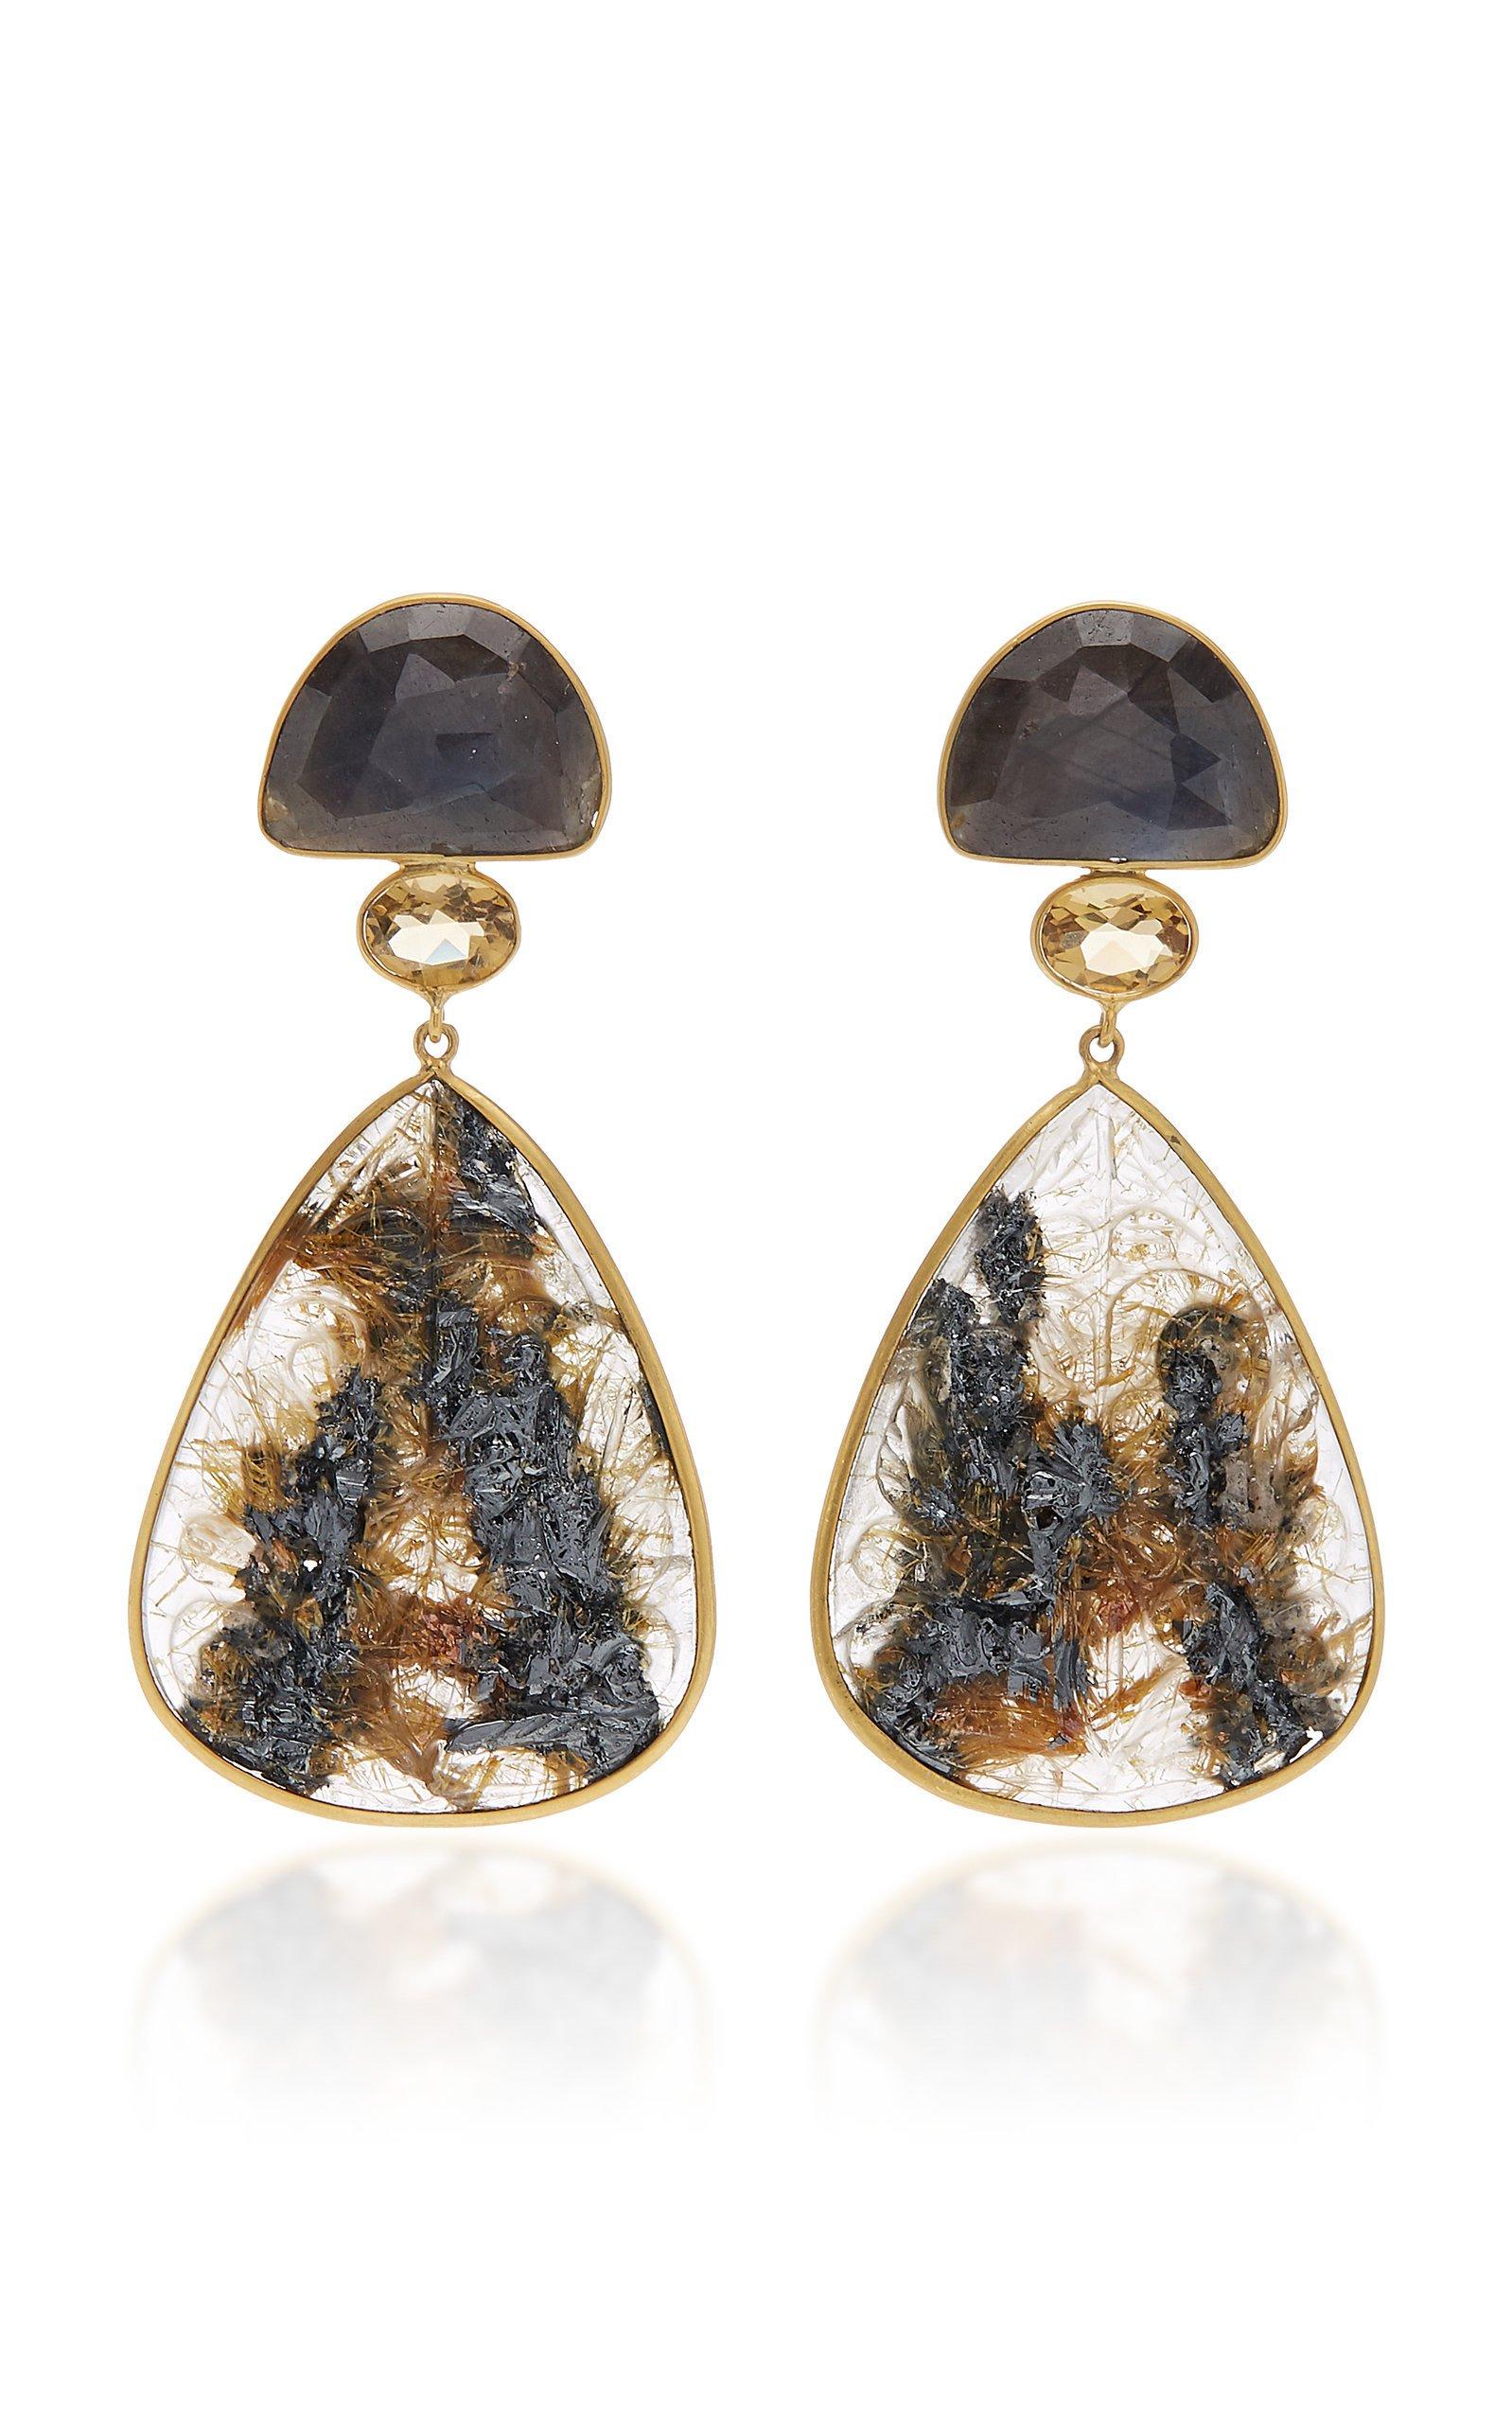 Bahina One of a Kind Sapphire Citrine and Rutilated Quartz Earrings